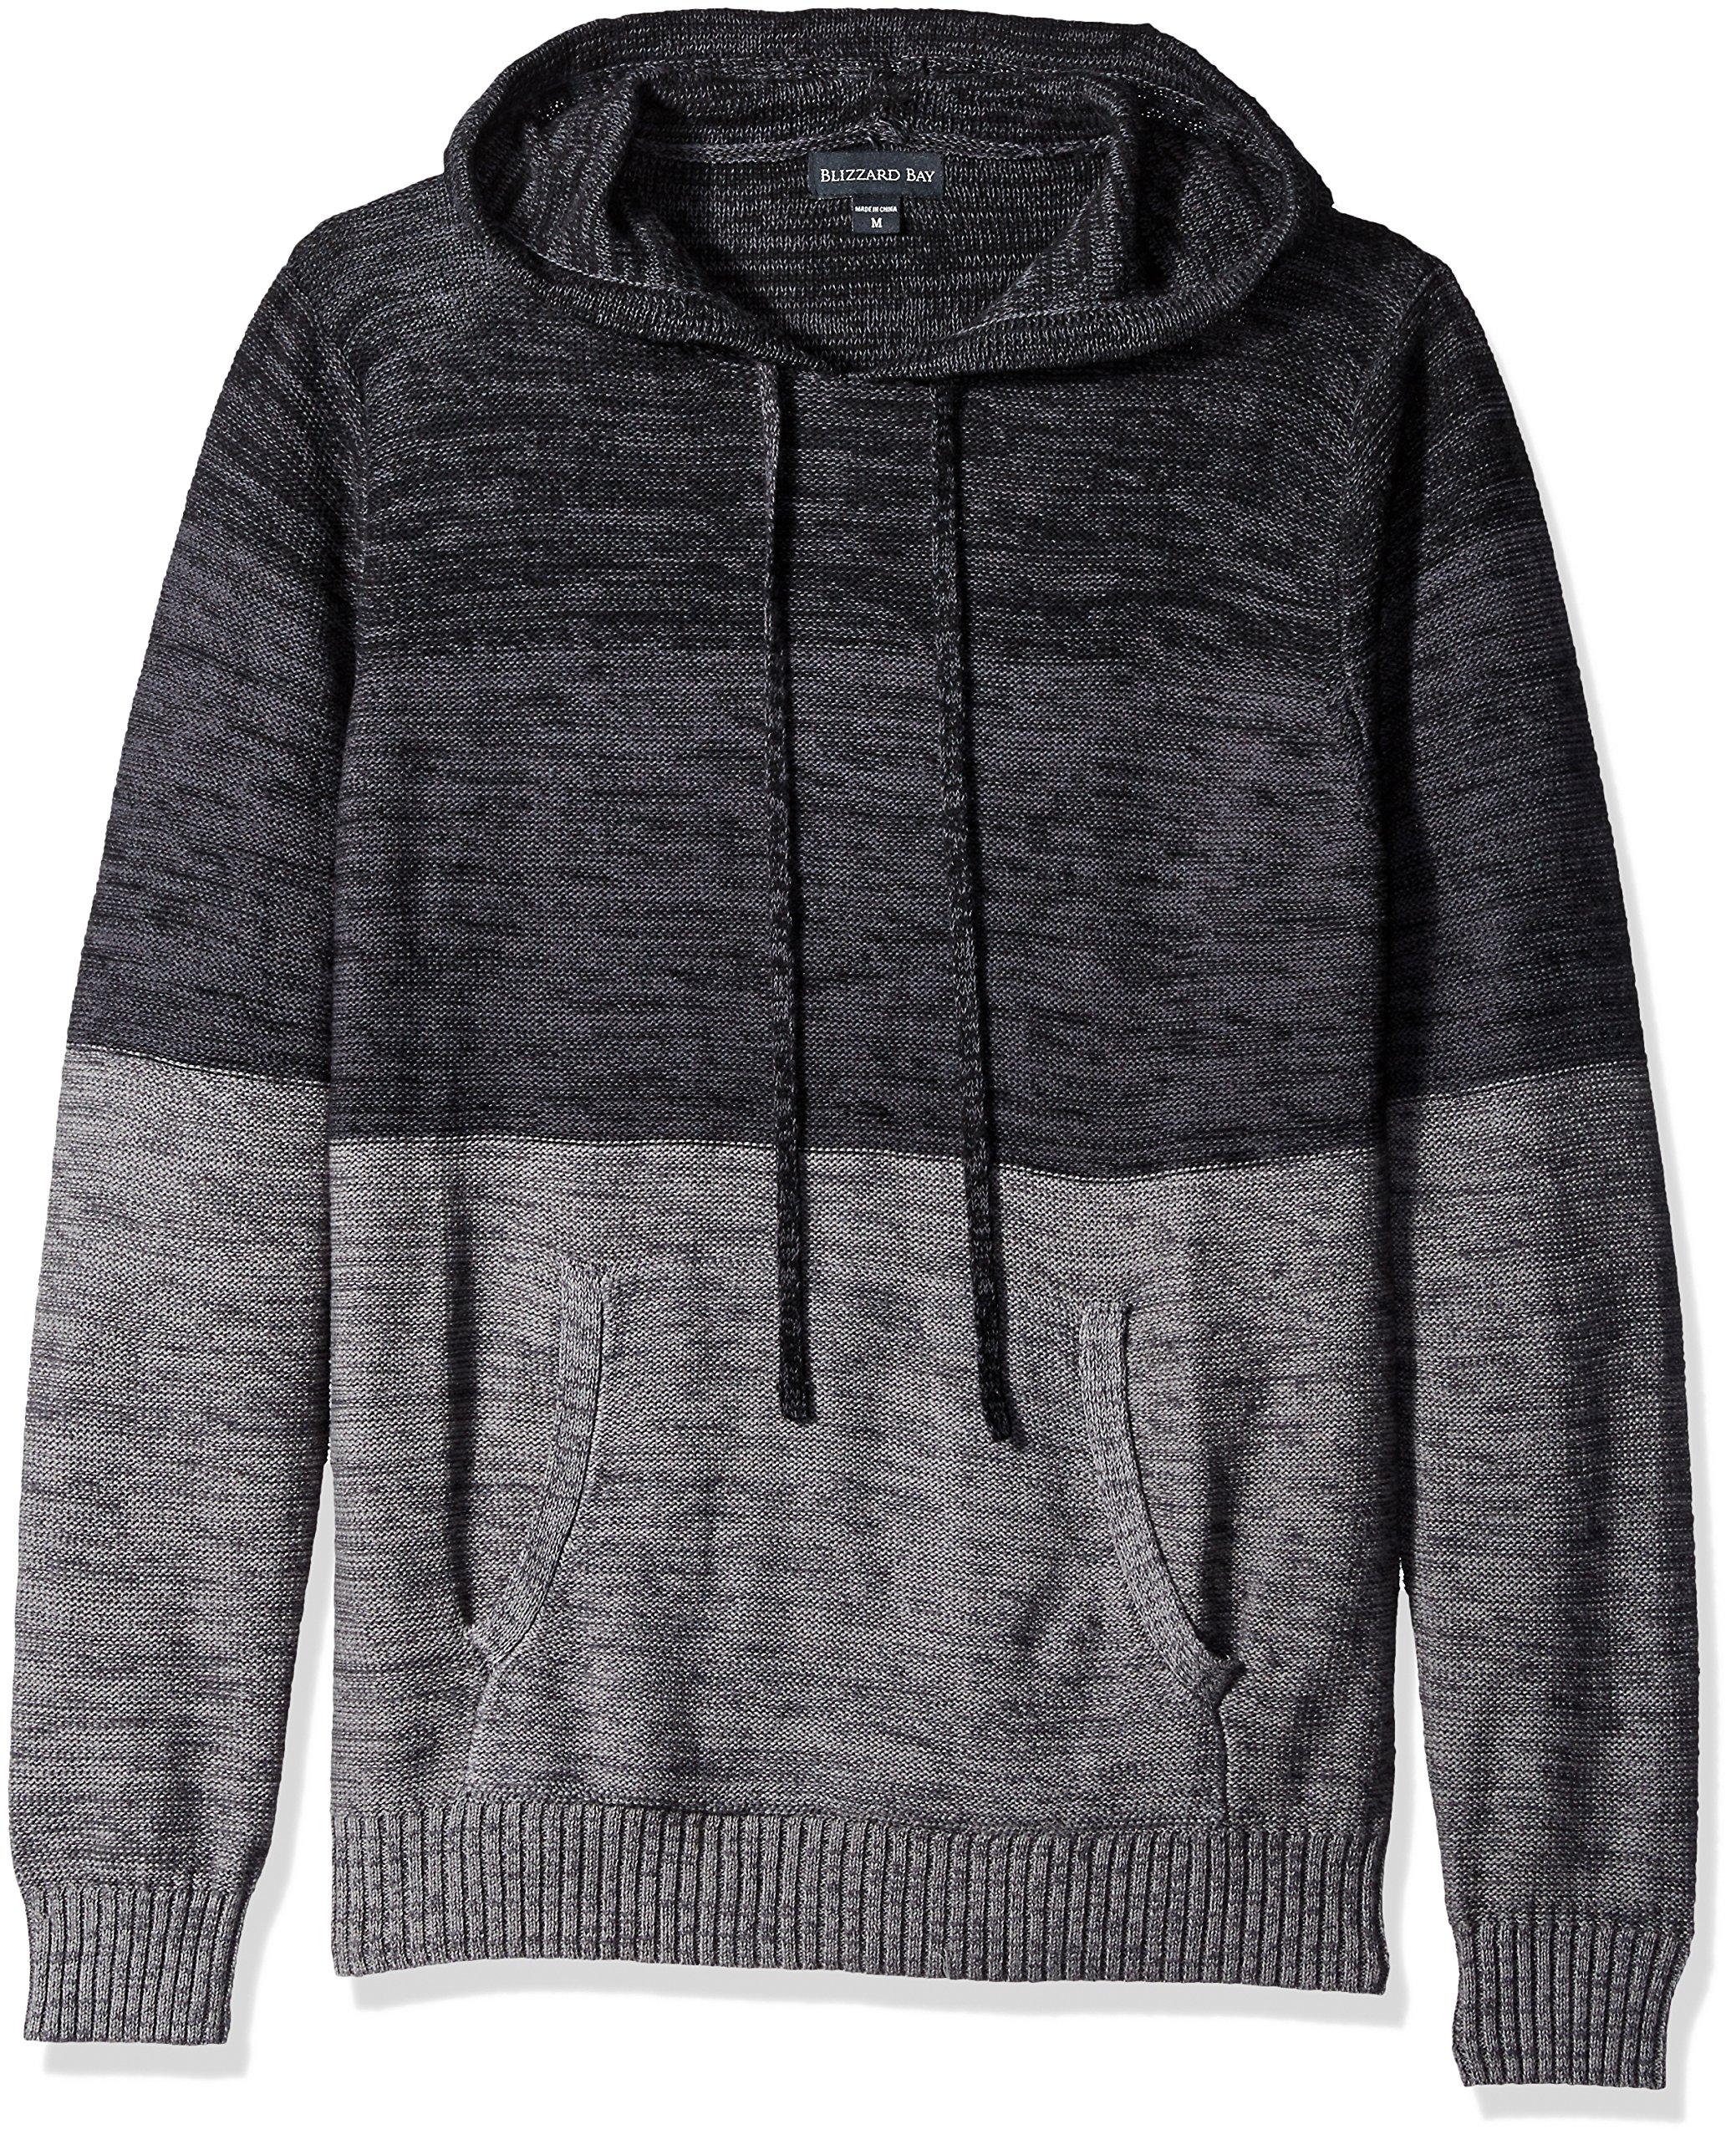 Blizzard Bay Men's Color Block Hooded Sweatshirt, Grey/Black, Small